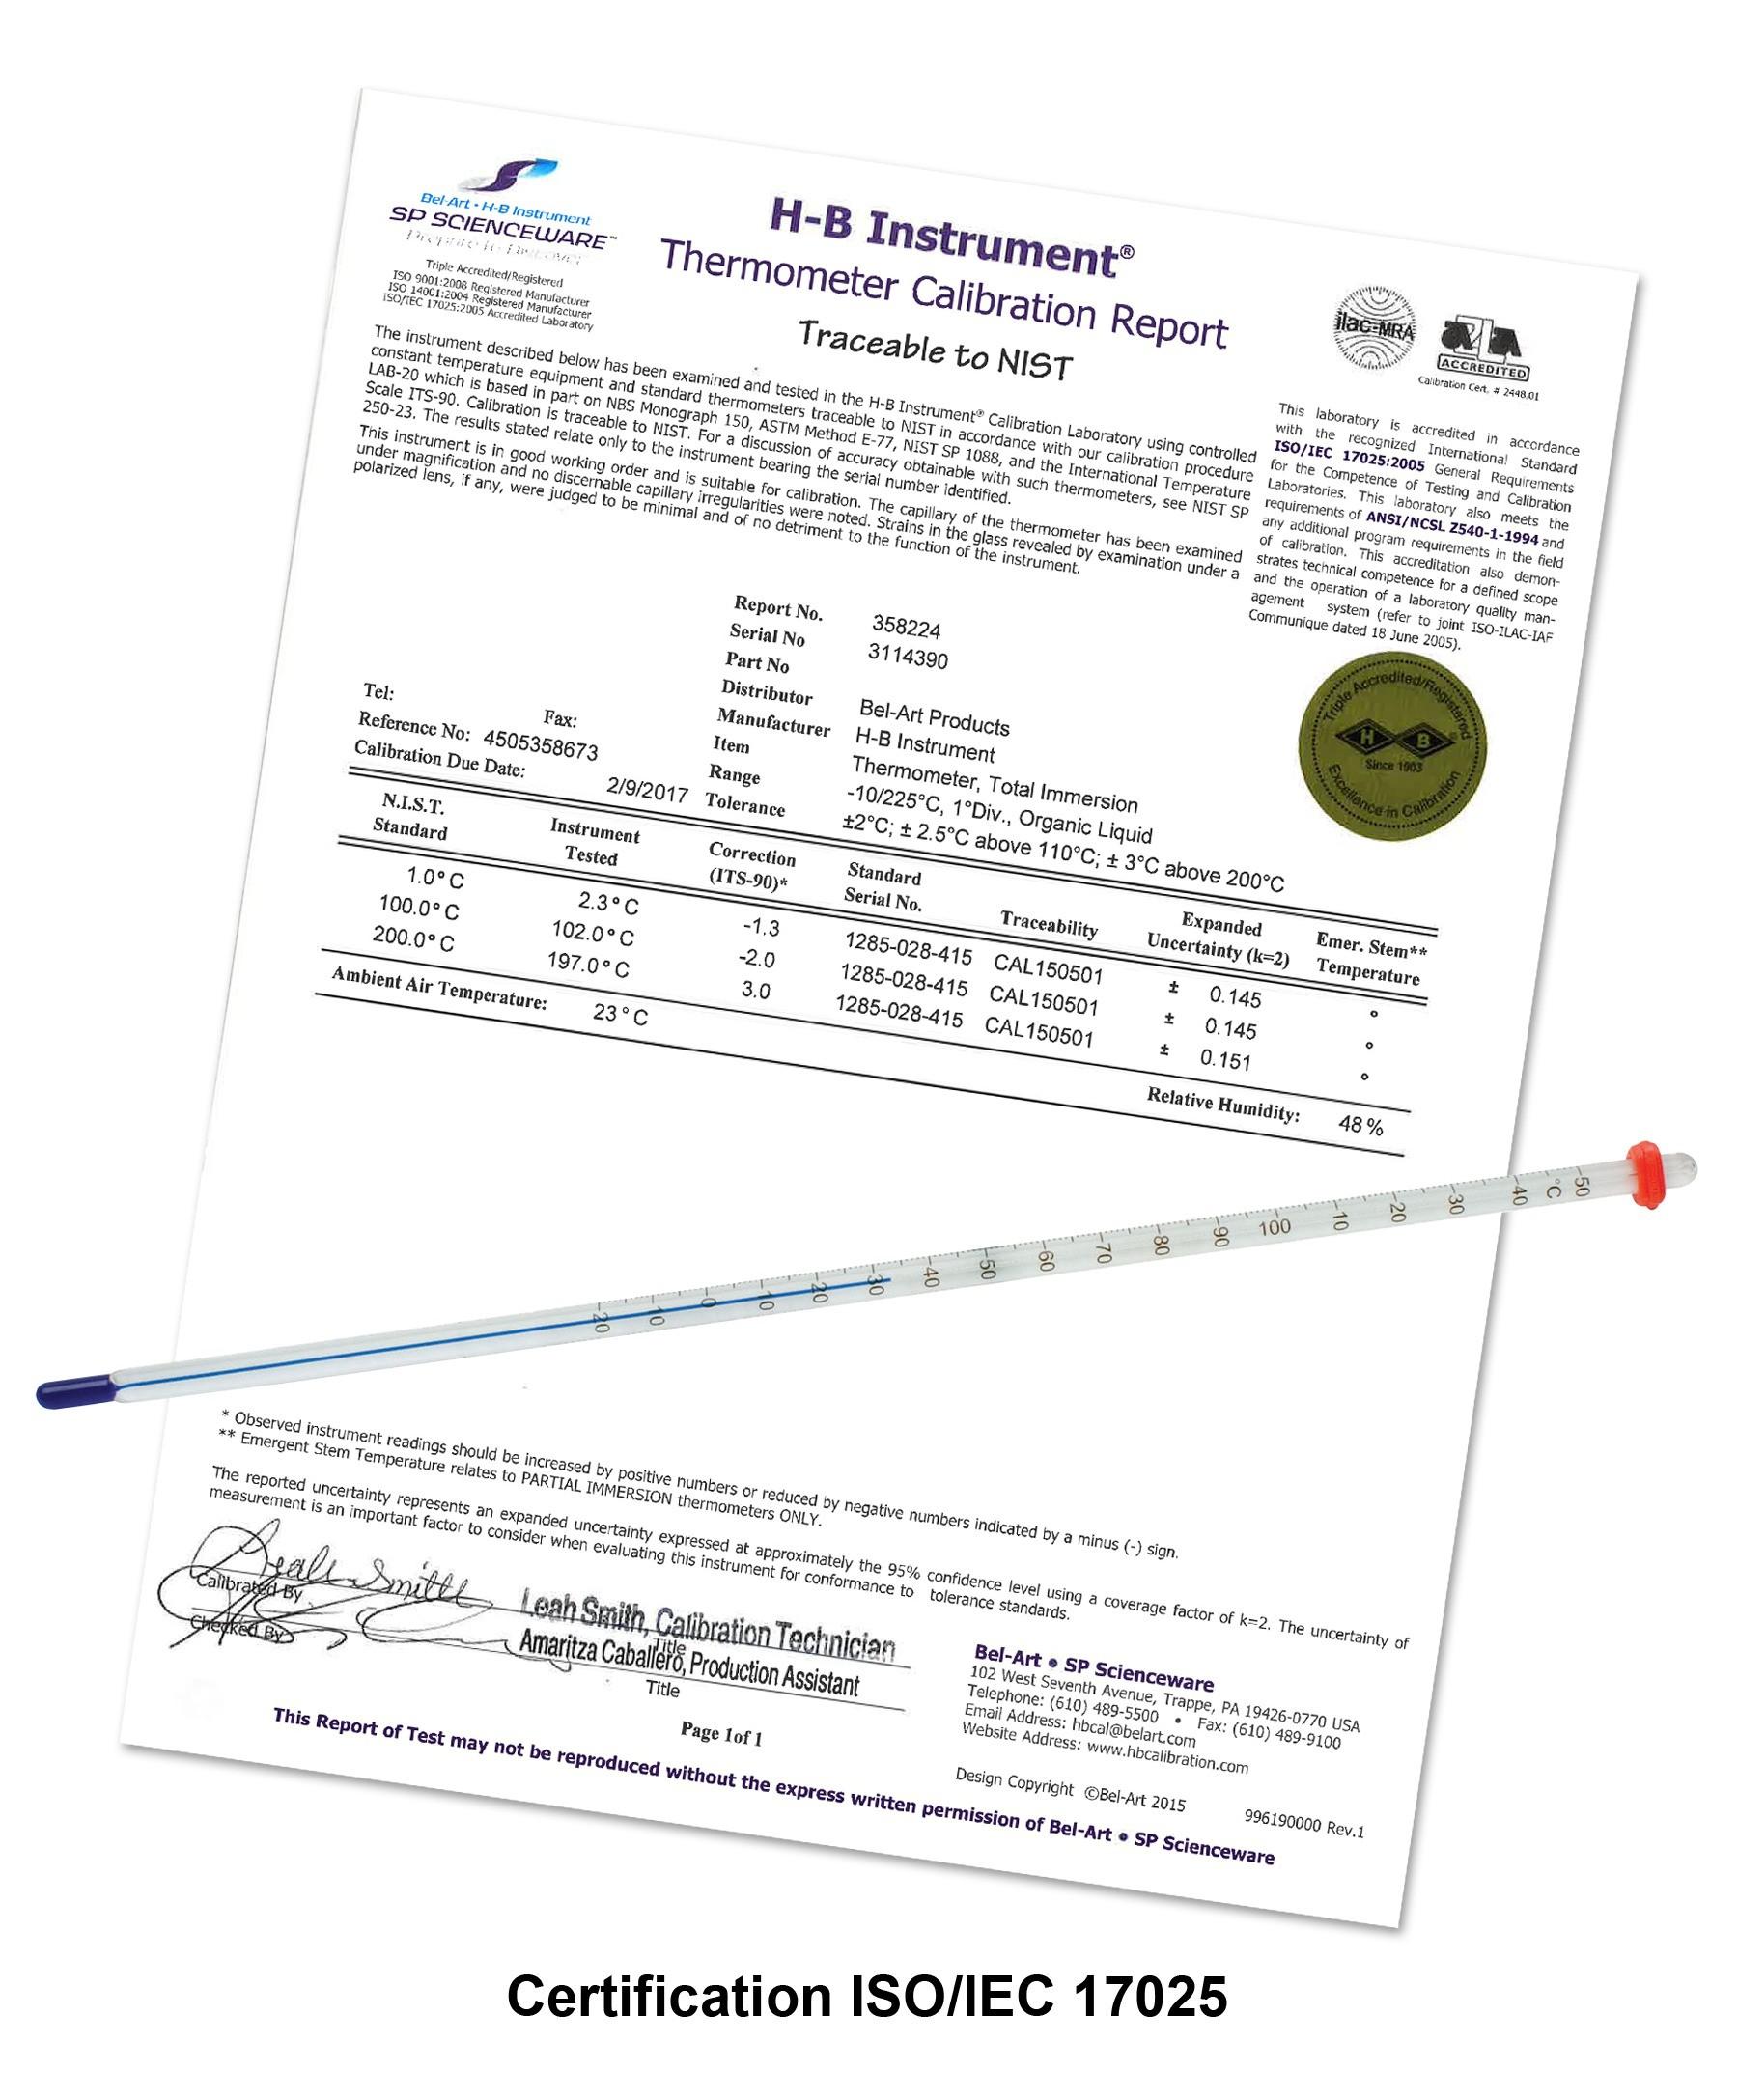 H-B DURAC Plus Calibrated Liquid-In-Glass Laboratory Thermometer; 1 to 61C, 76mm Immersion, Organic Liquid Fill